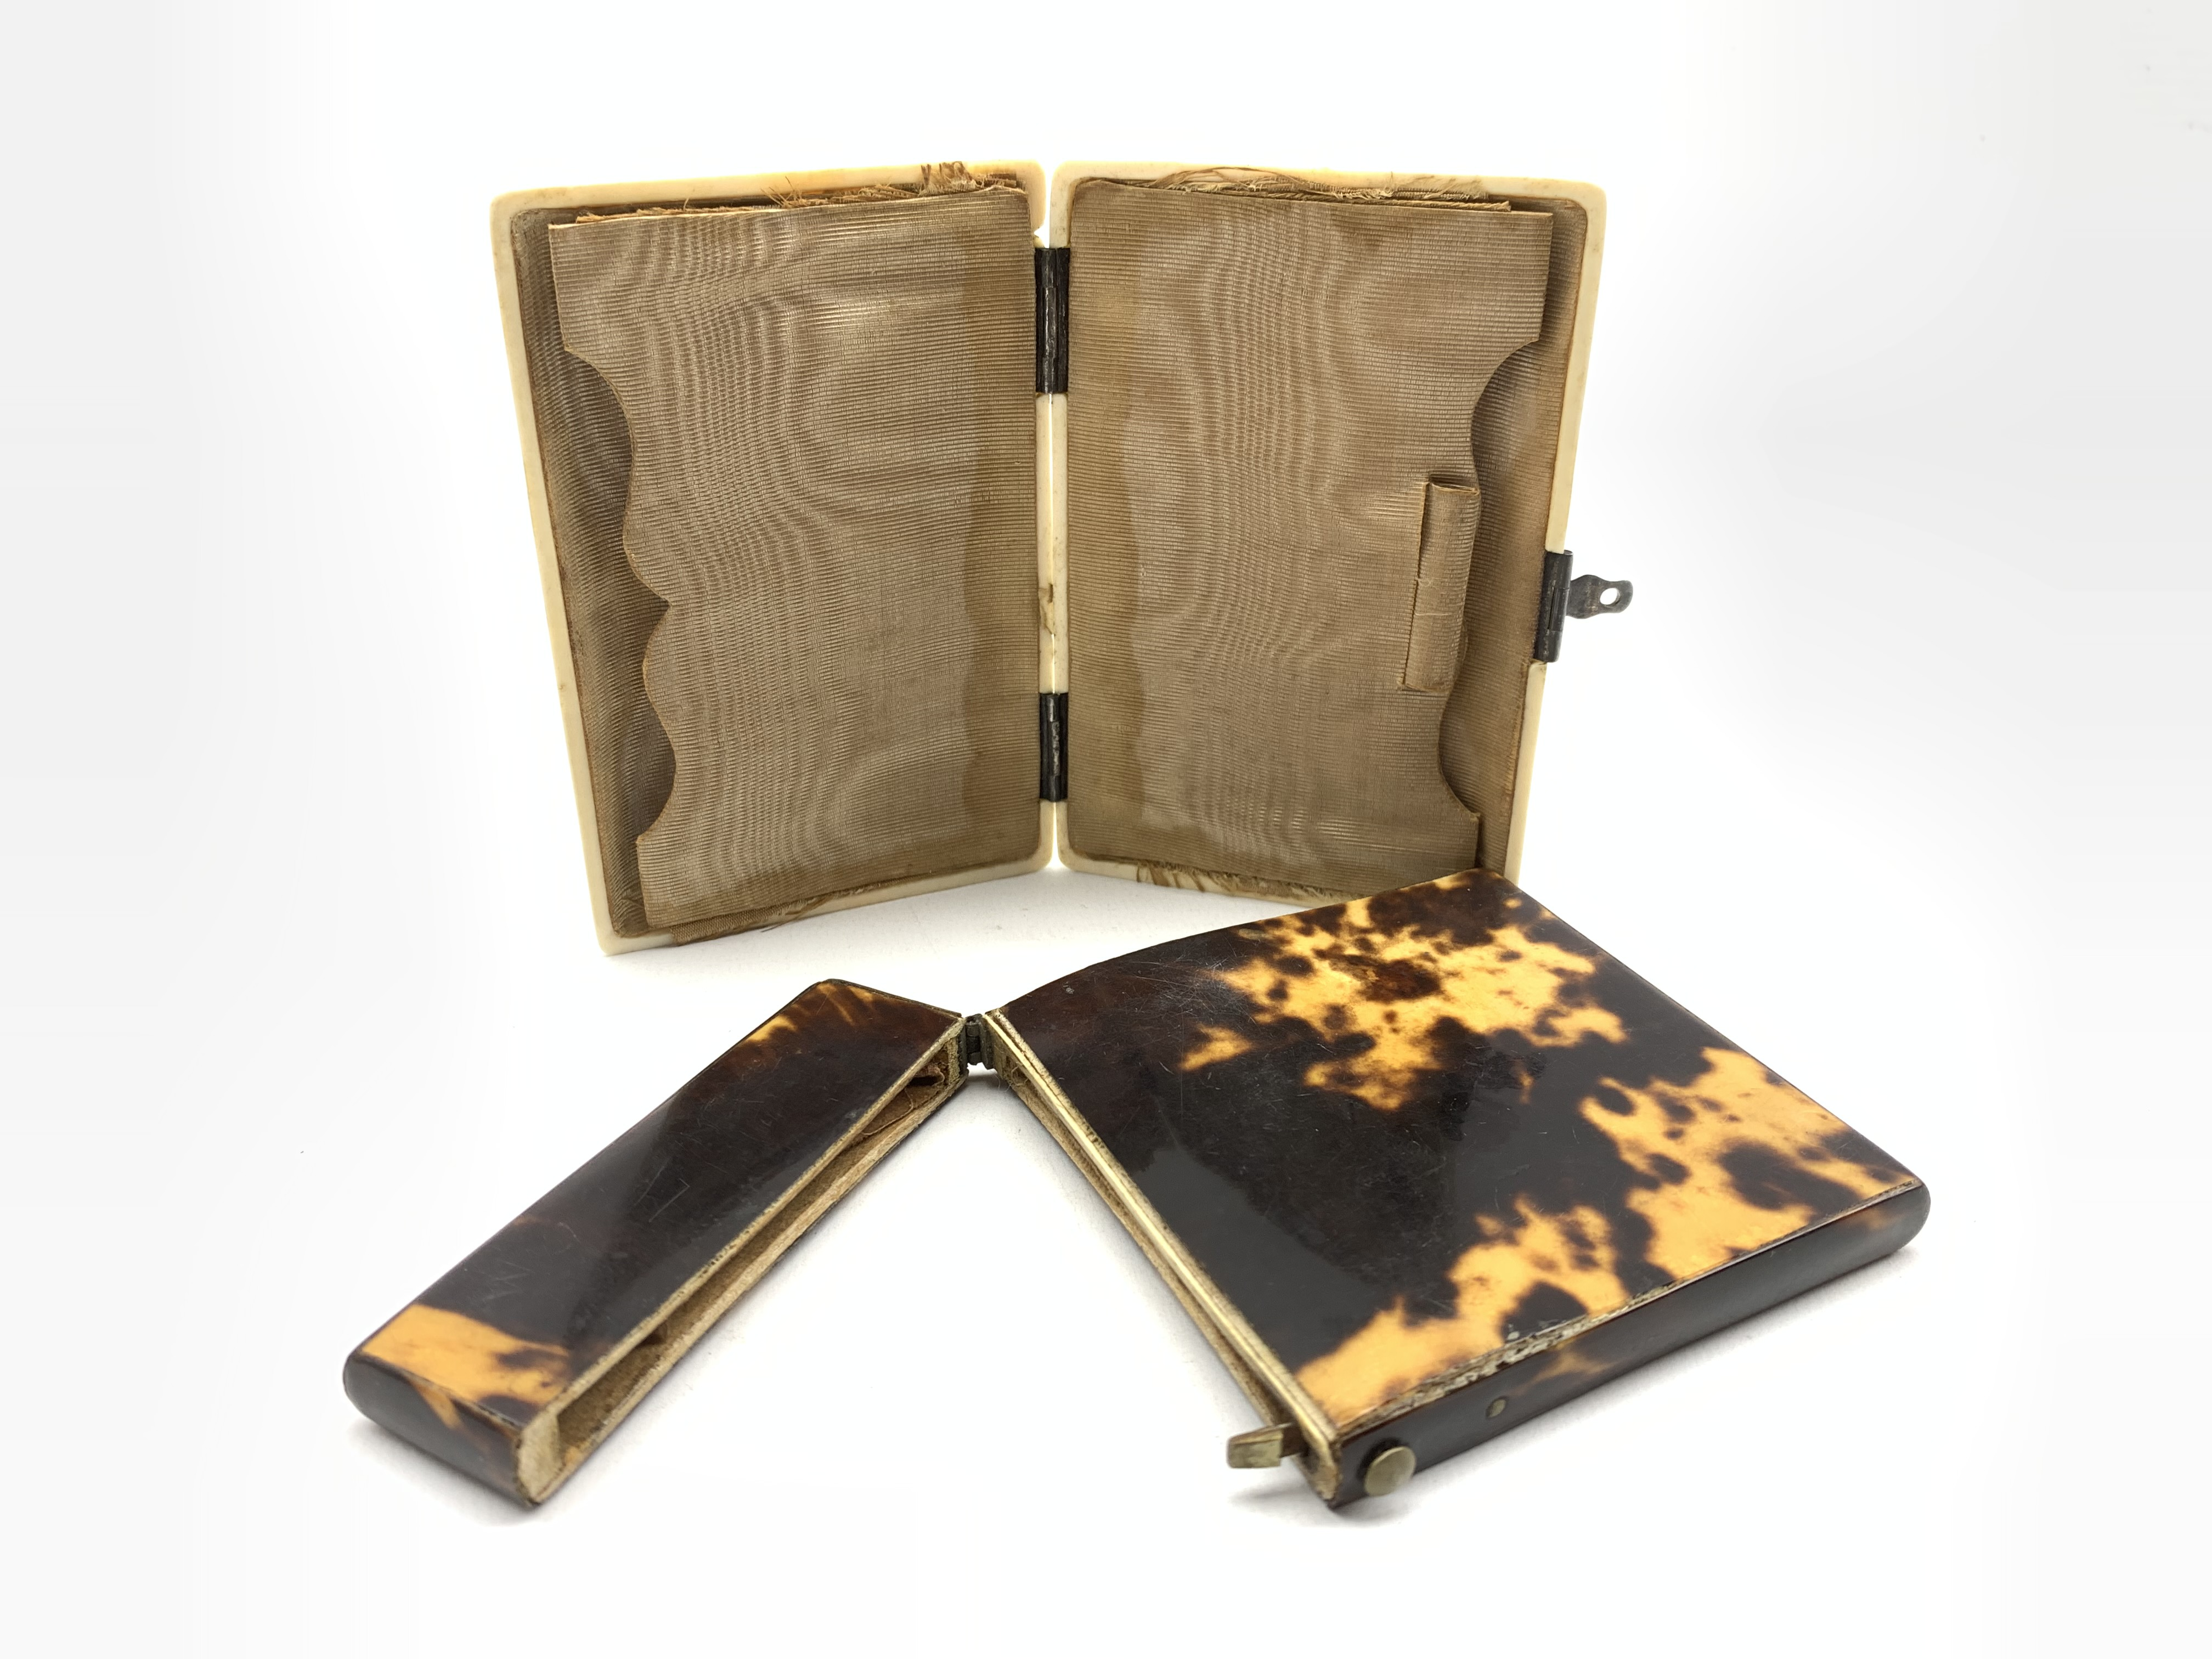 Victorian ivory rectangular card case - Image 5 of 5